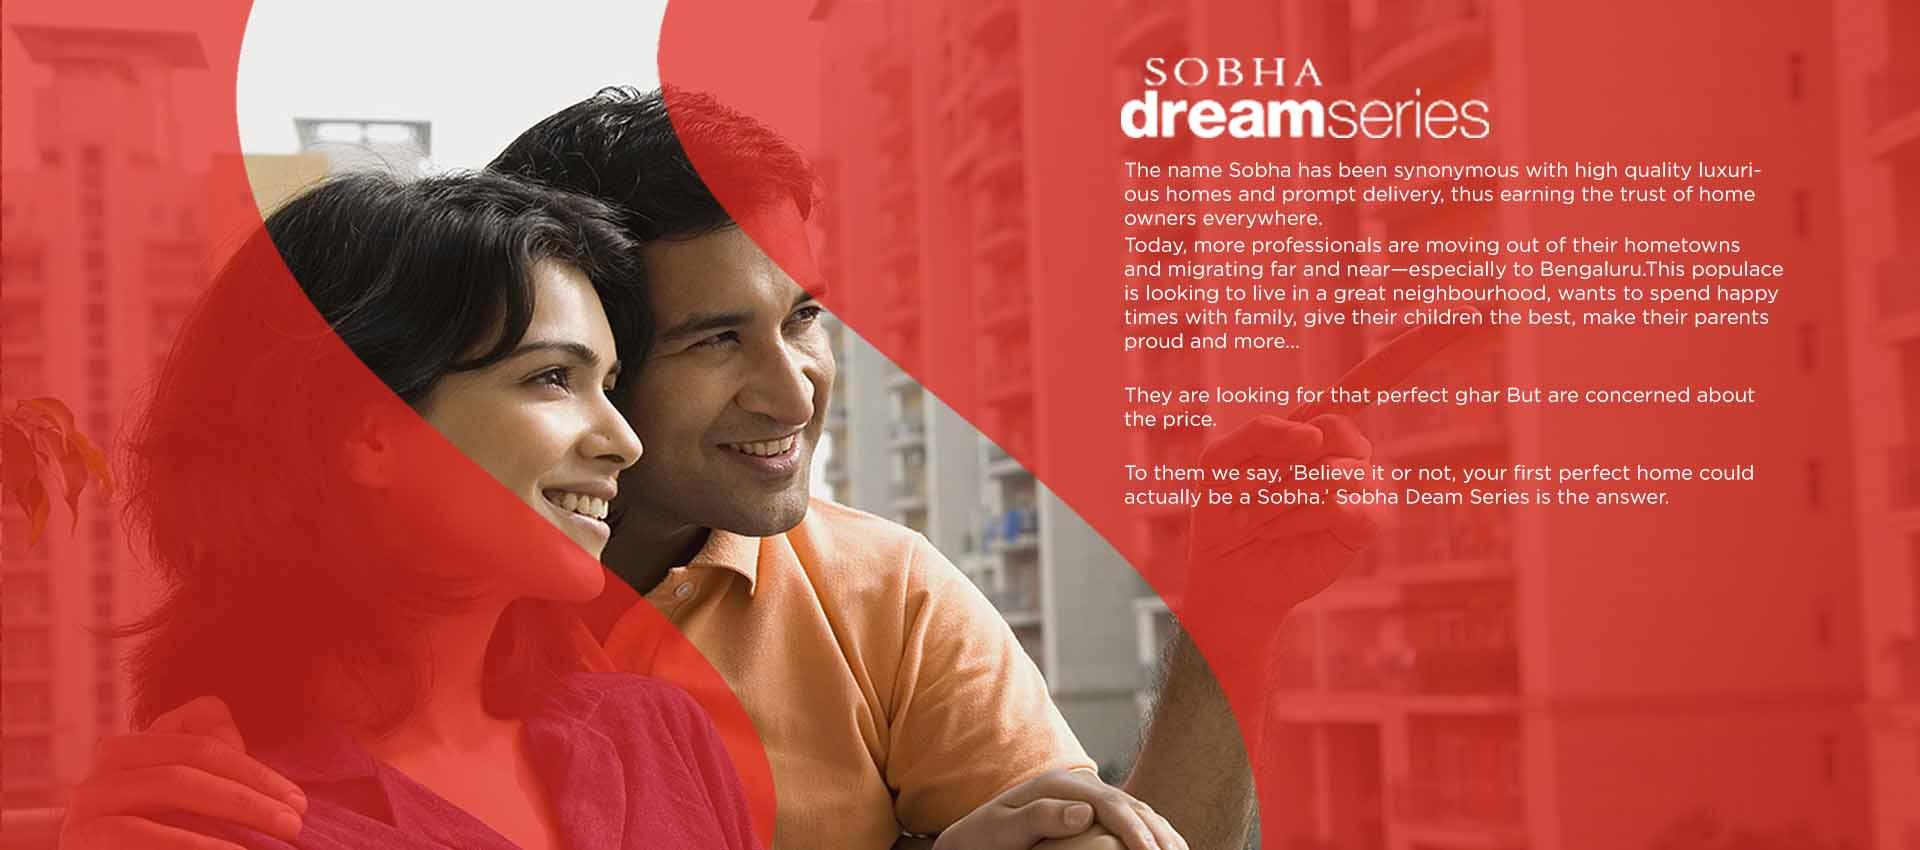 Sobha Dream Series